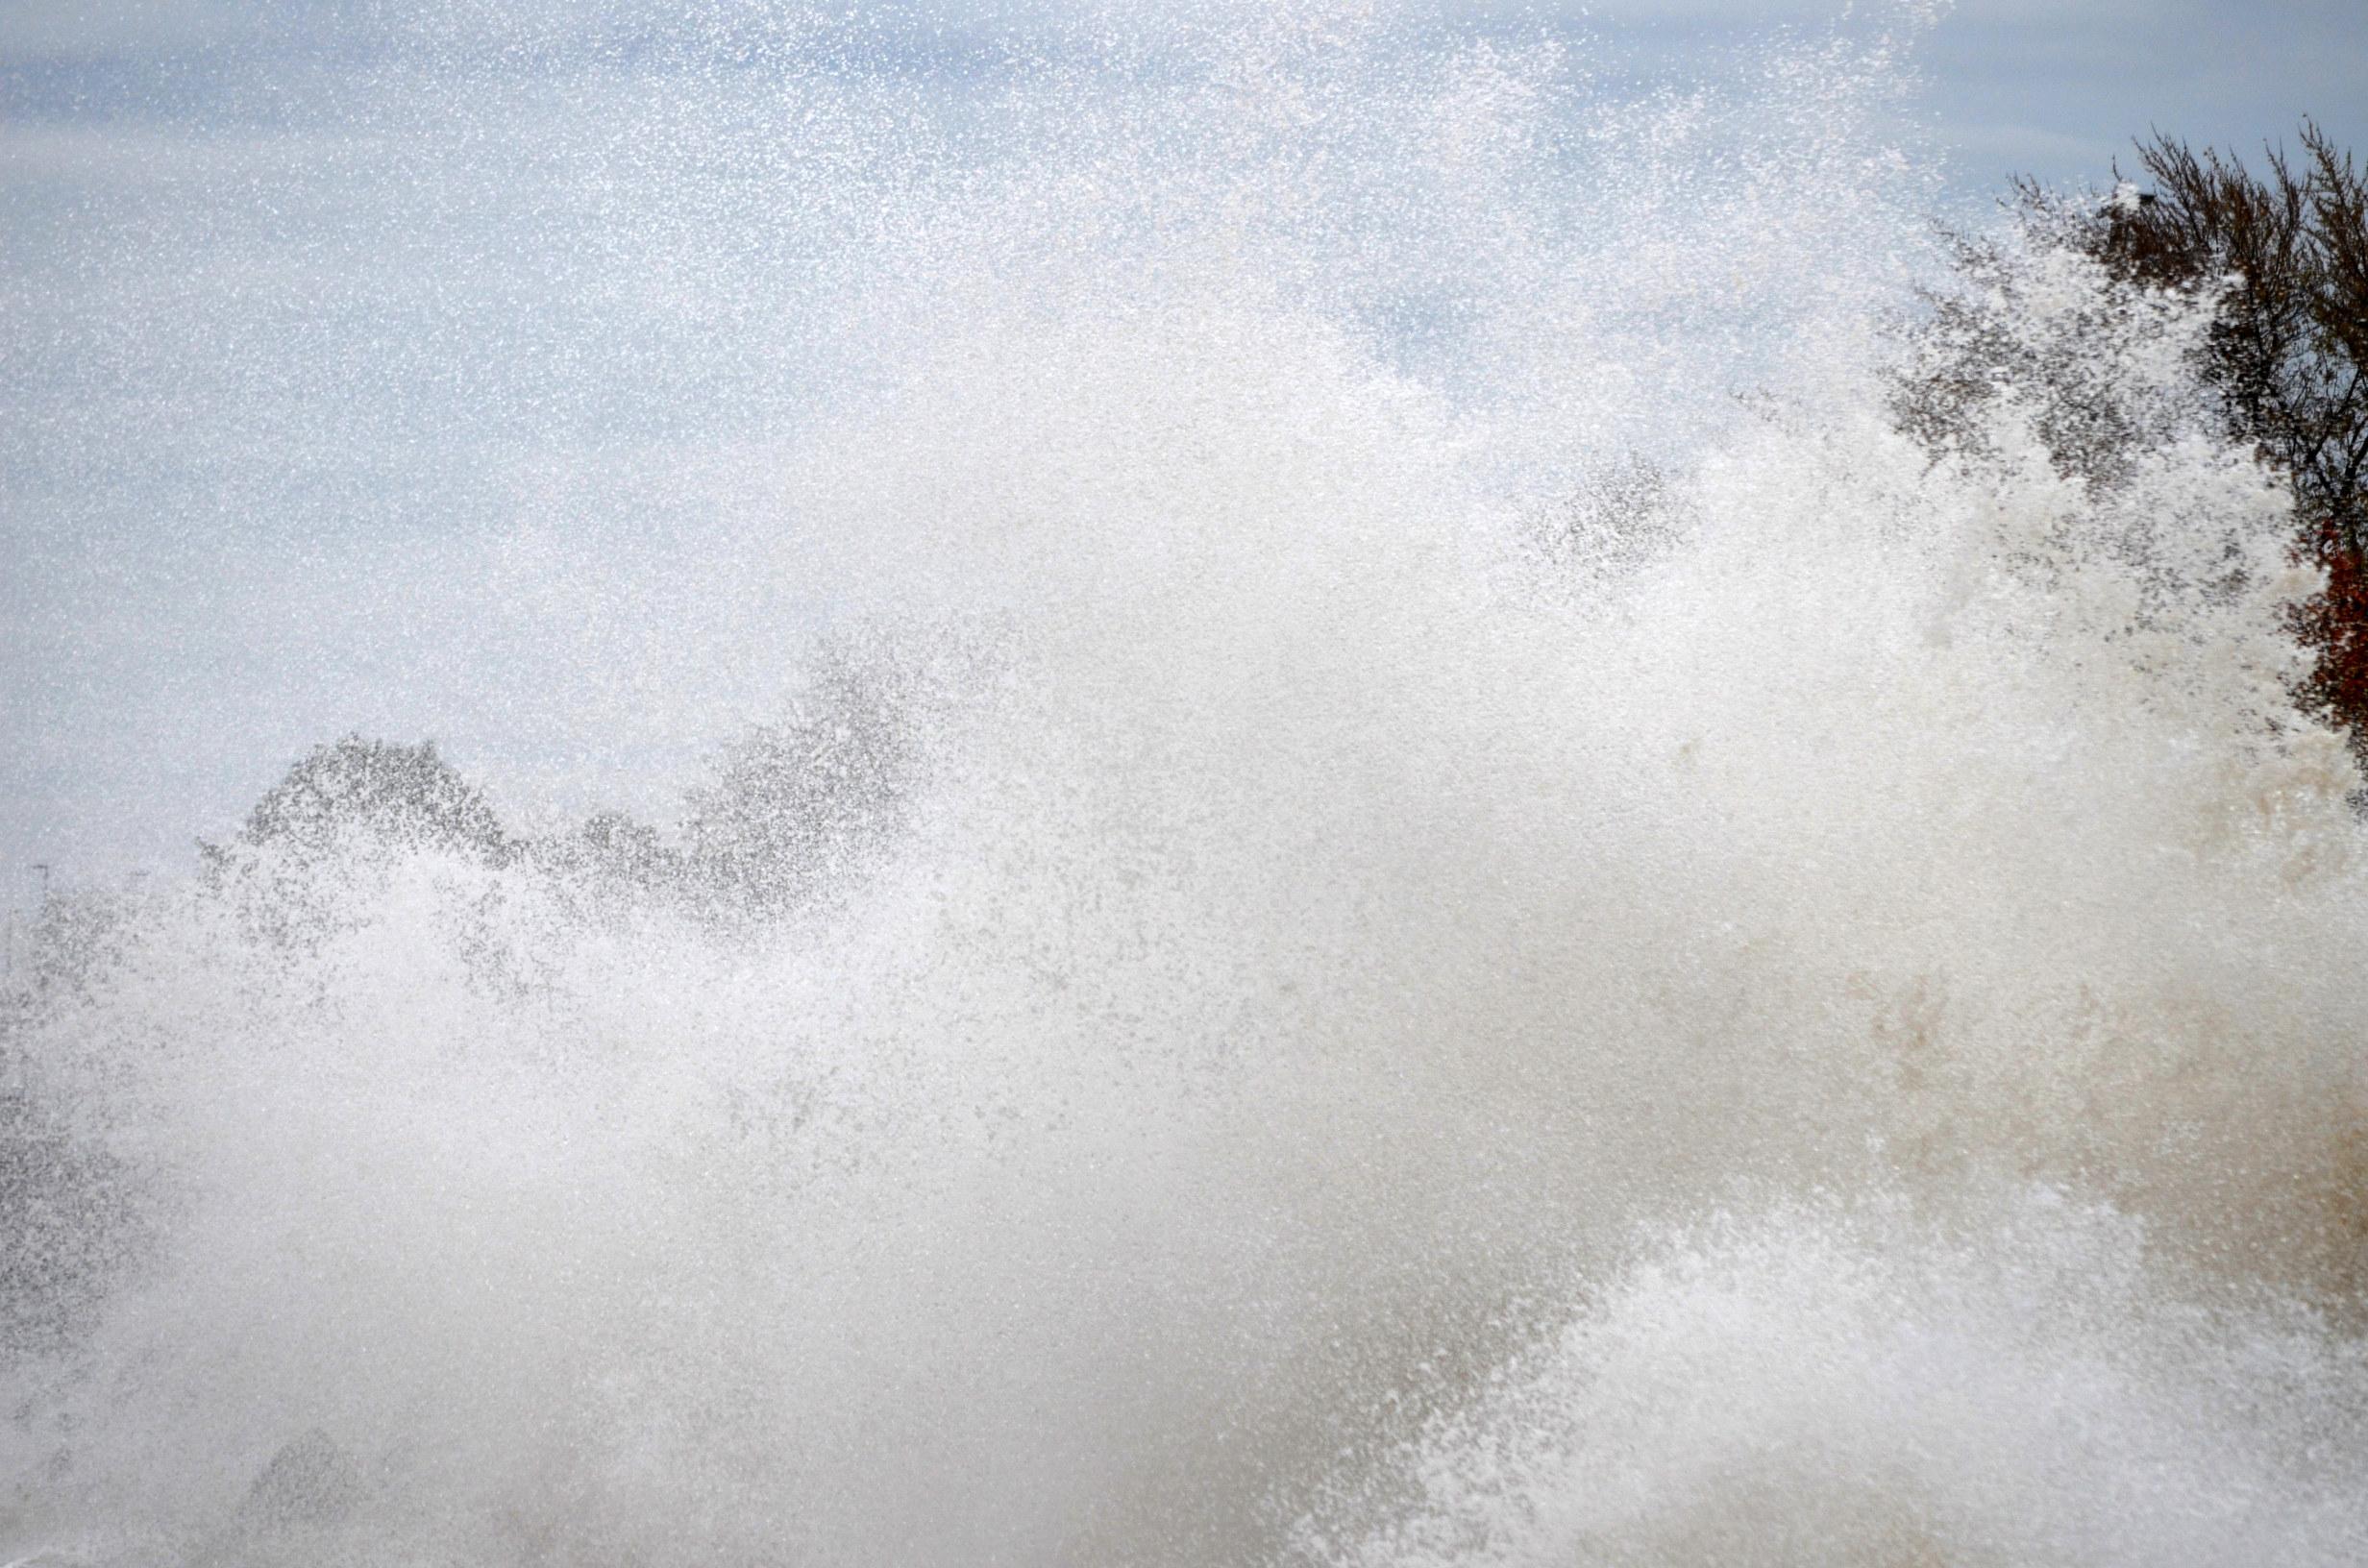 Hurracine Sandy  on Lake Michigan 6